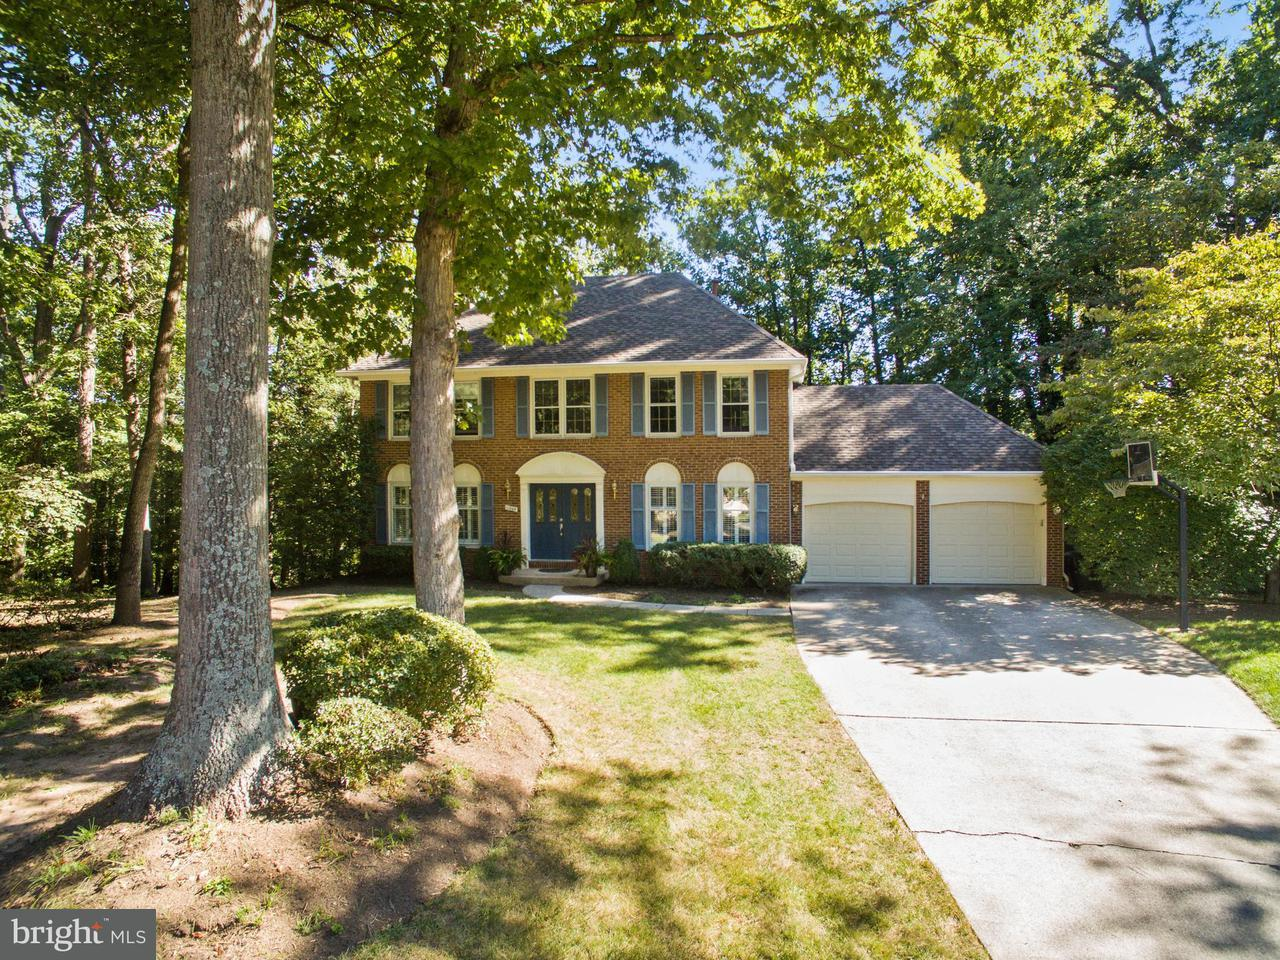 Casa Unifamiliar por un Venta en 11869 FAWN RIDGE Lane 11869 FAWN RIDGE Lane Reston, Virginia 20194 Estados Unidos